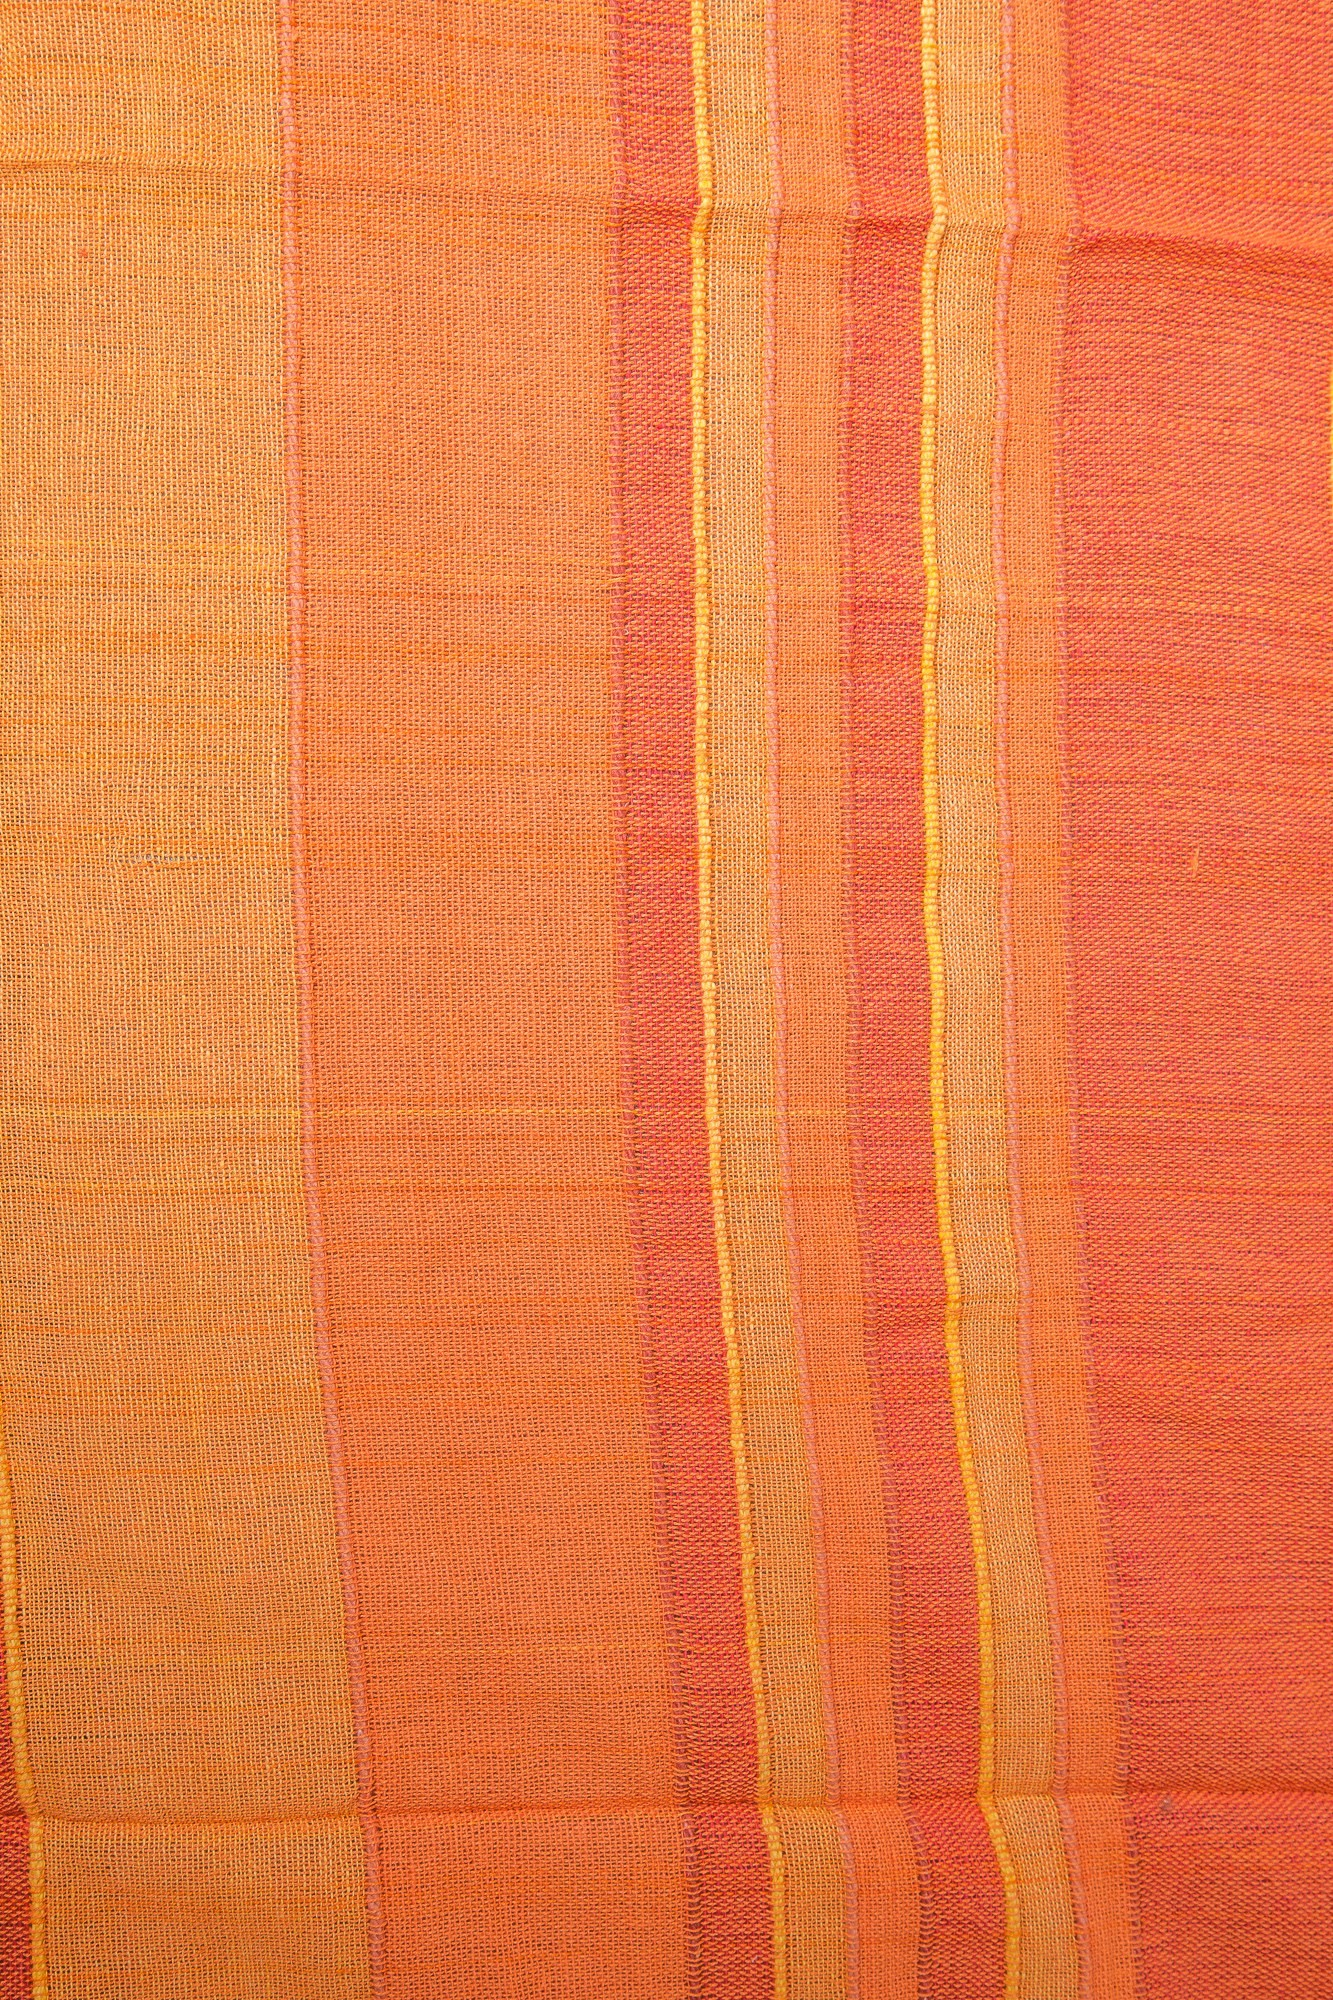 Cuvertura single portocalie in dungi